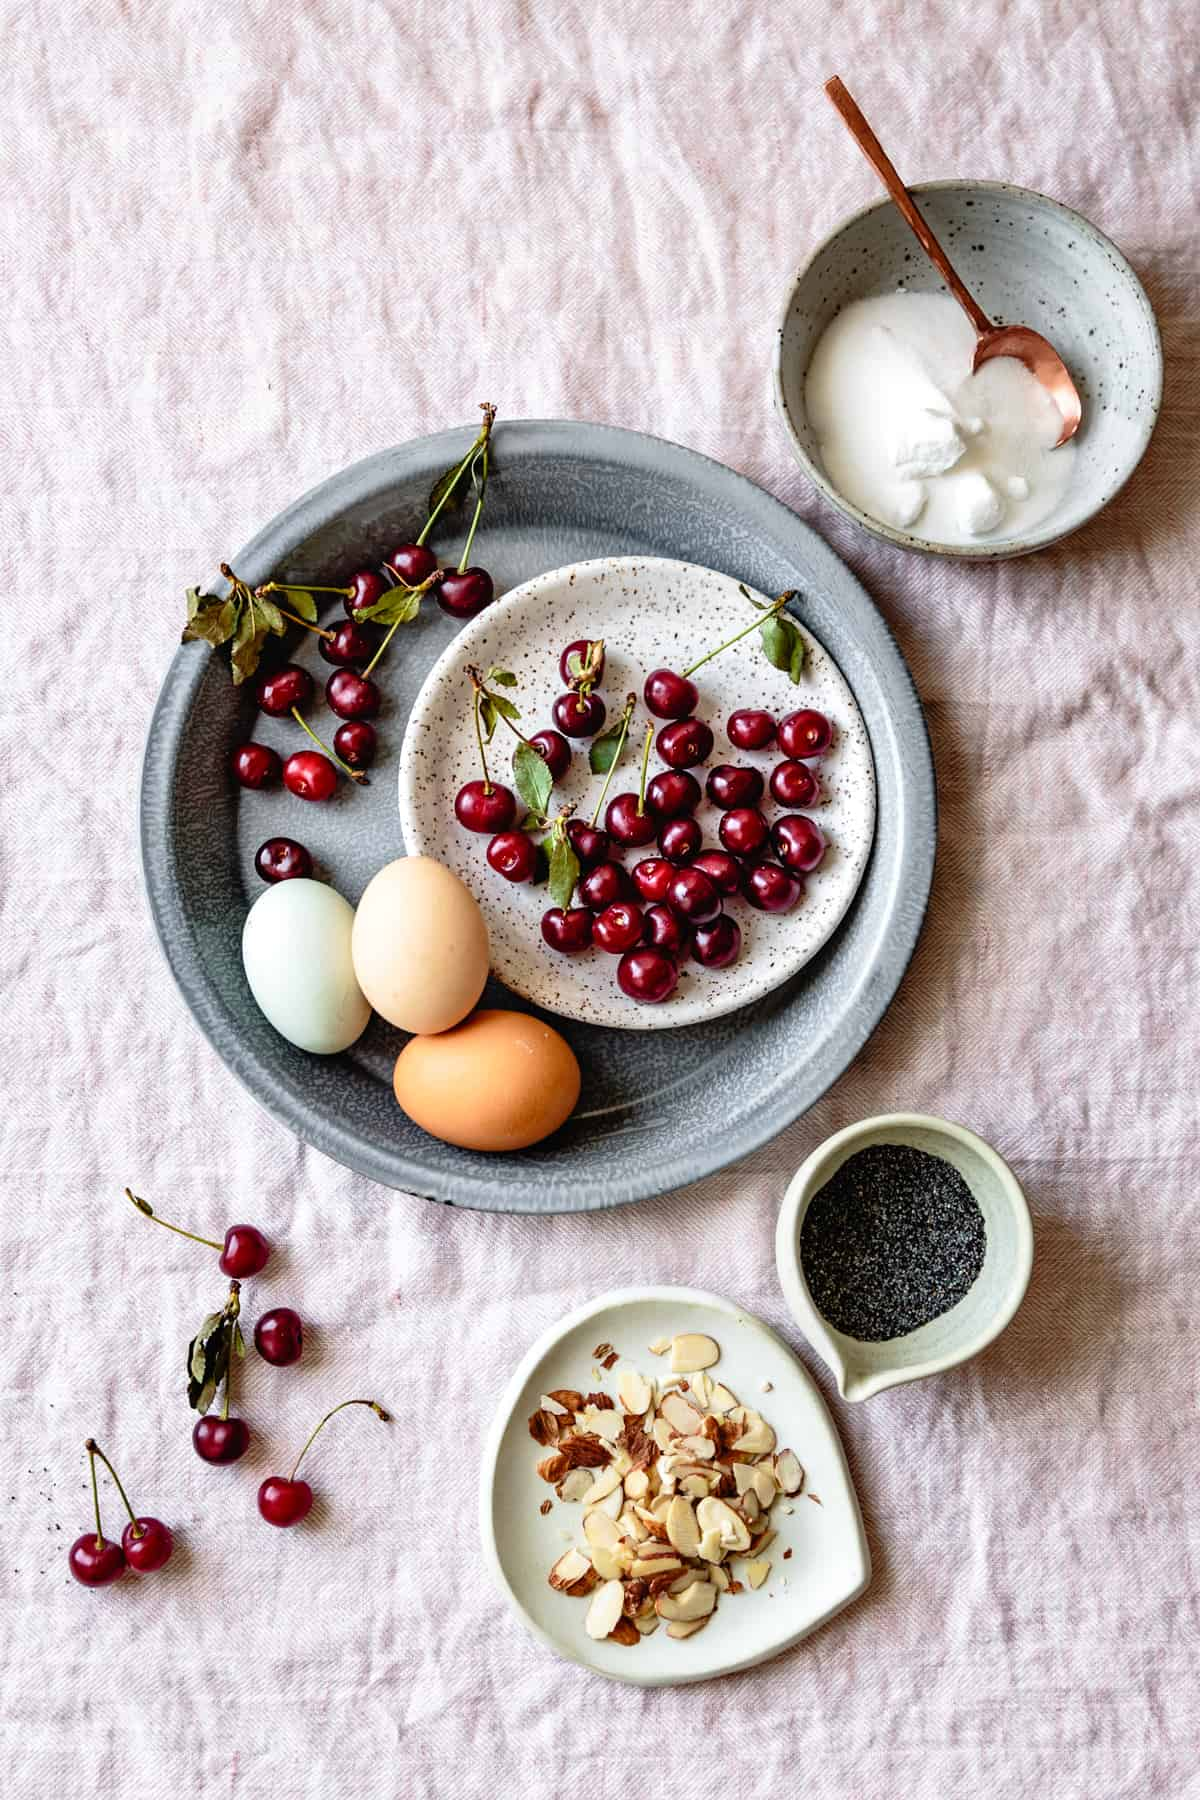 eggs on plate